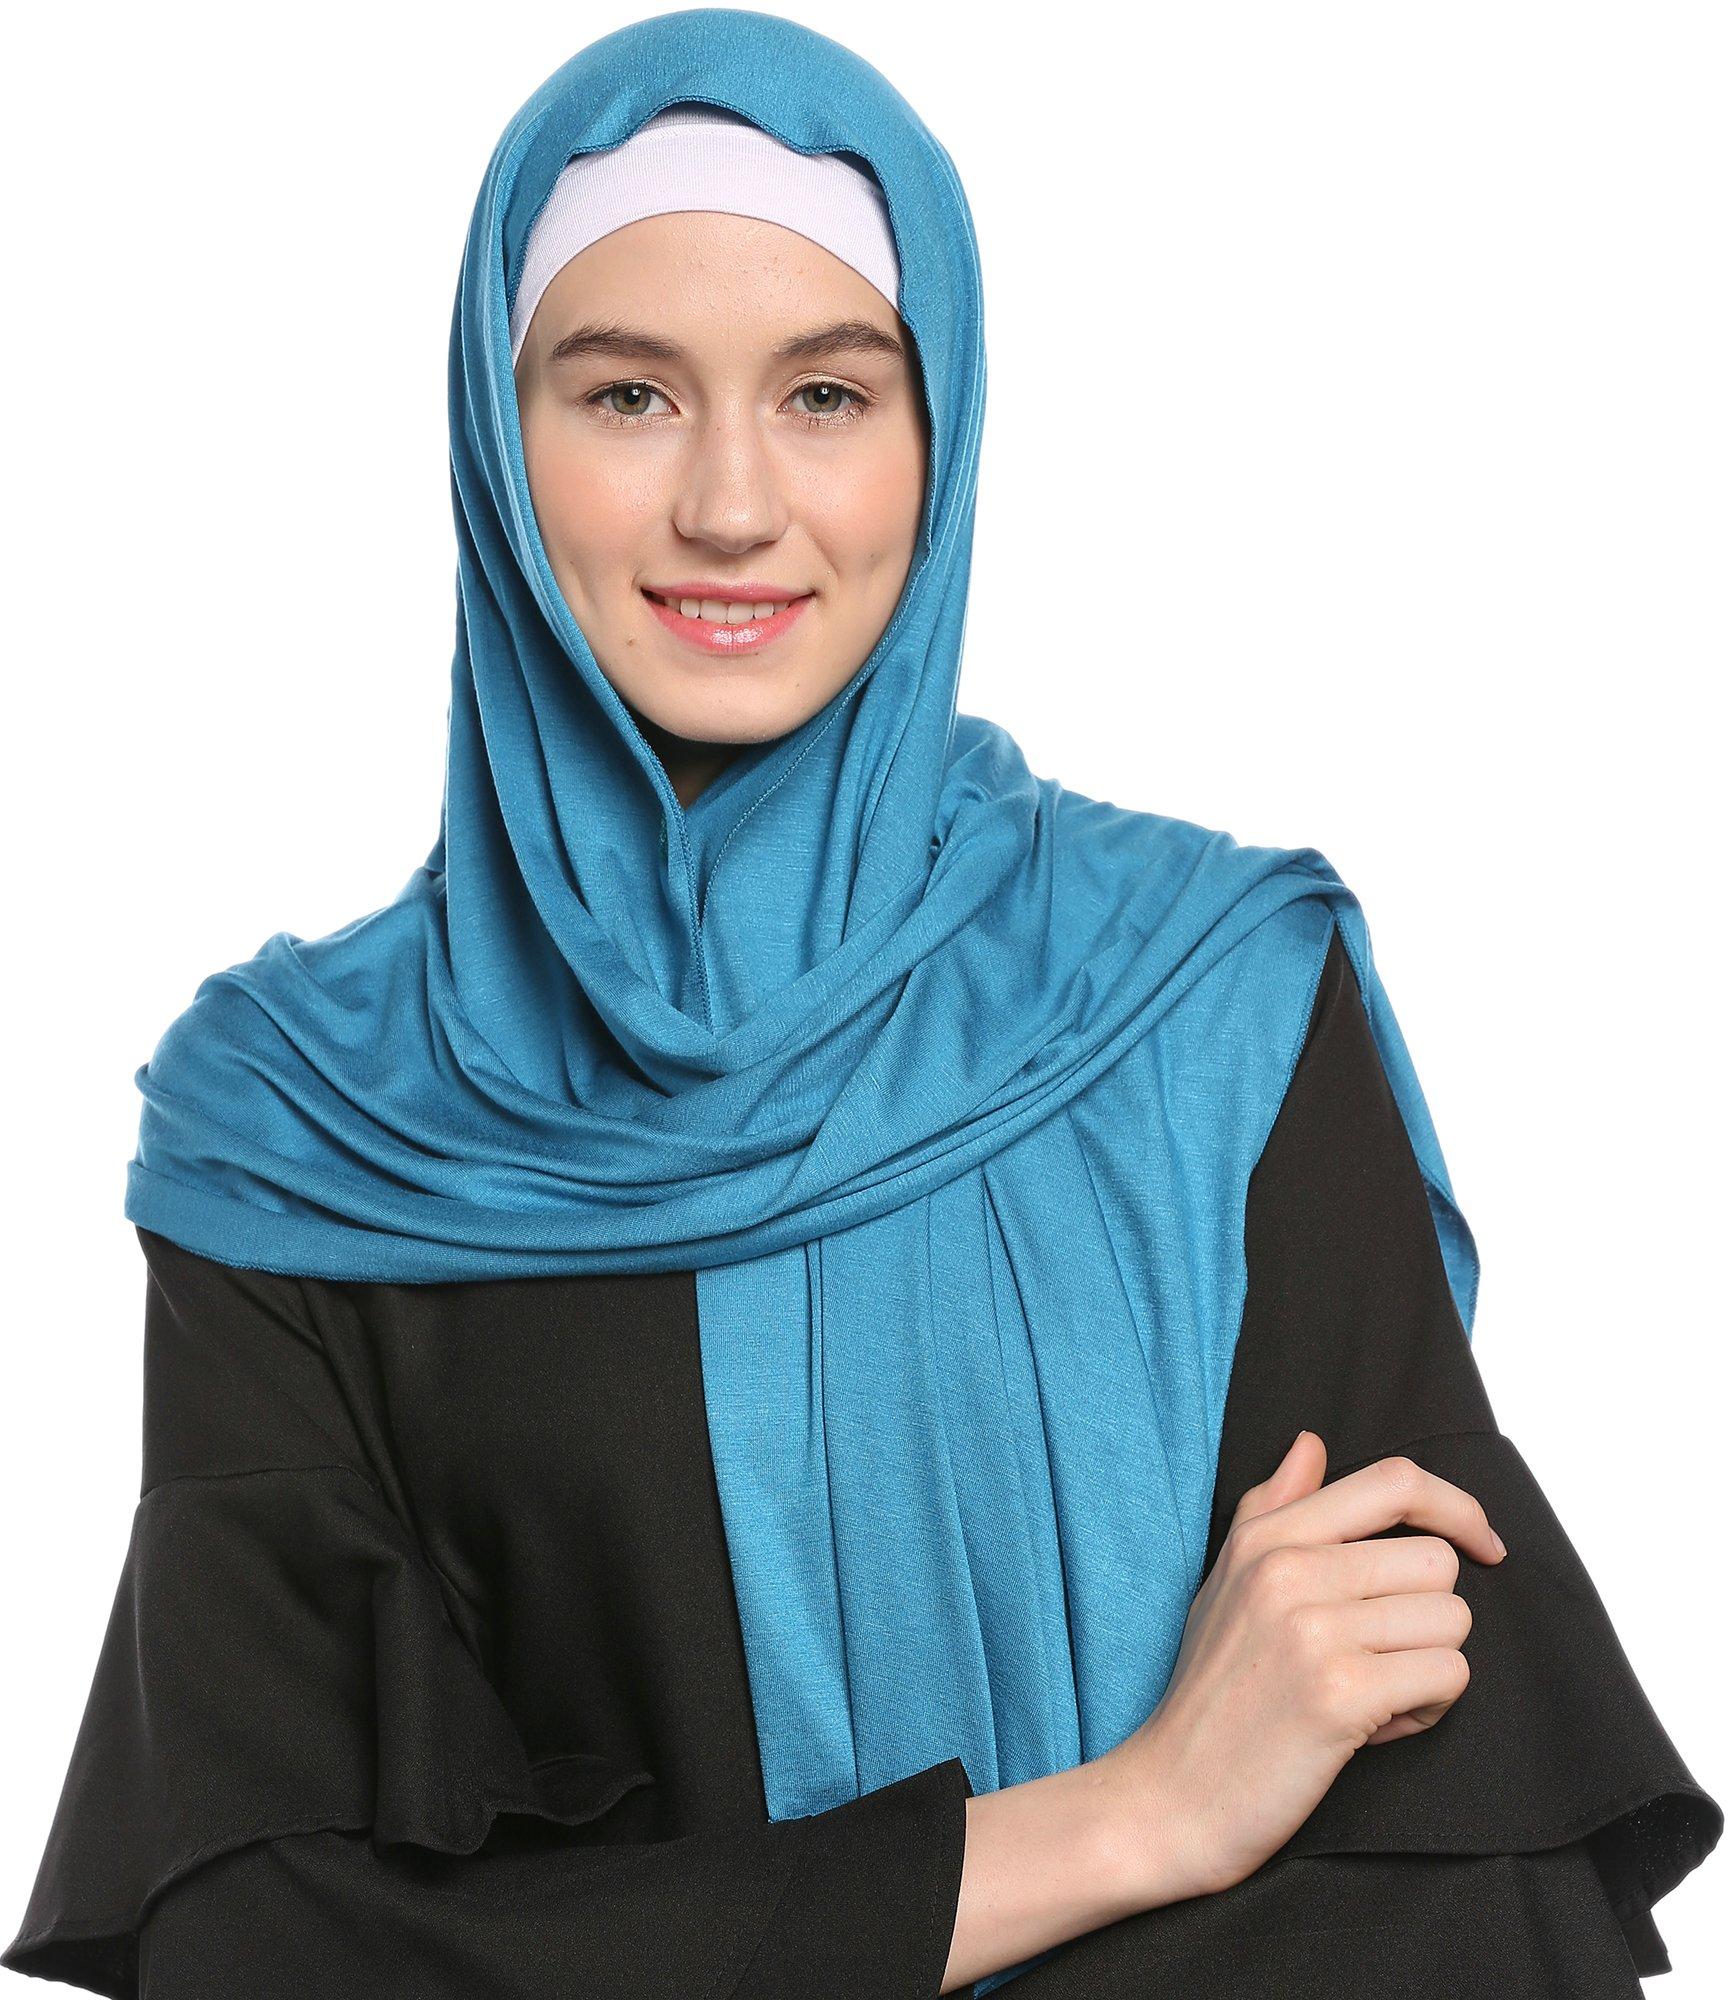 Ababalaya Womens Lightweight Cotton Jersey Hijab Scarves Shawls